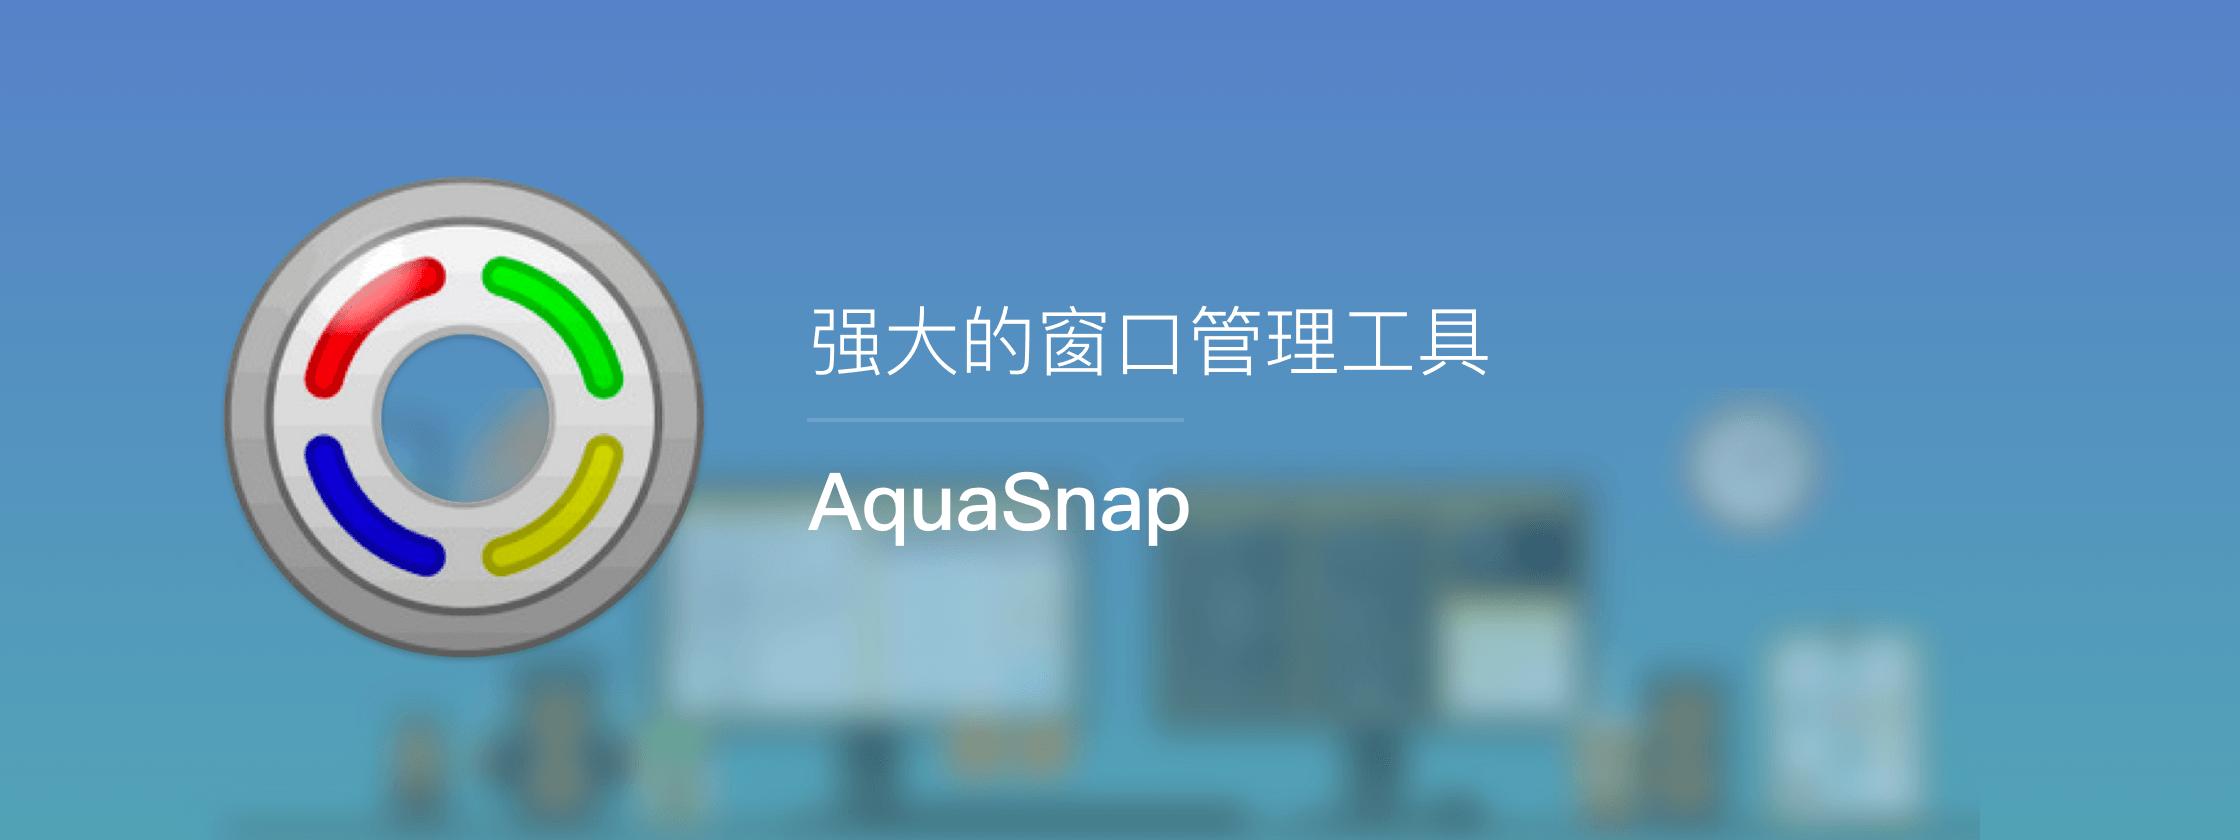 AquaSnap for Win 强大的窗口管理工具